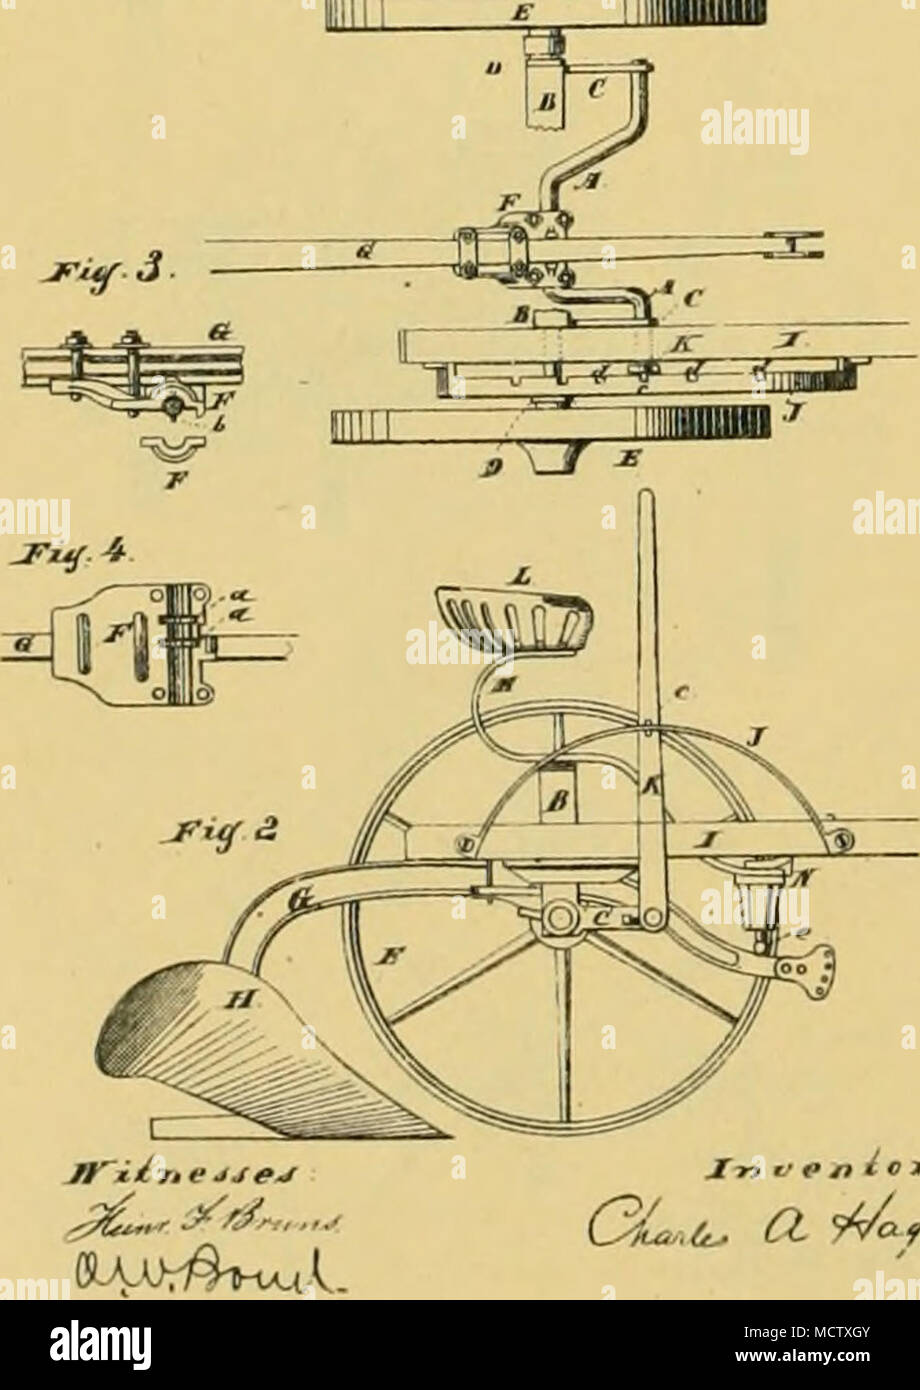 . CL..(^ a. â M^fc<^y. J. L. LADOHLIN Wheel Plow No. 241 140 Patented lune 21. 1881. - Stock Image